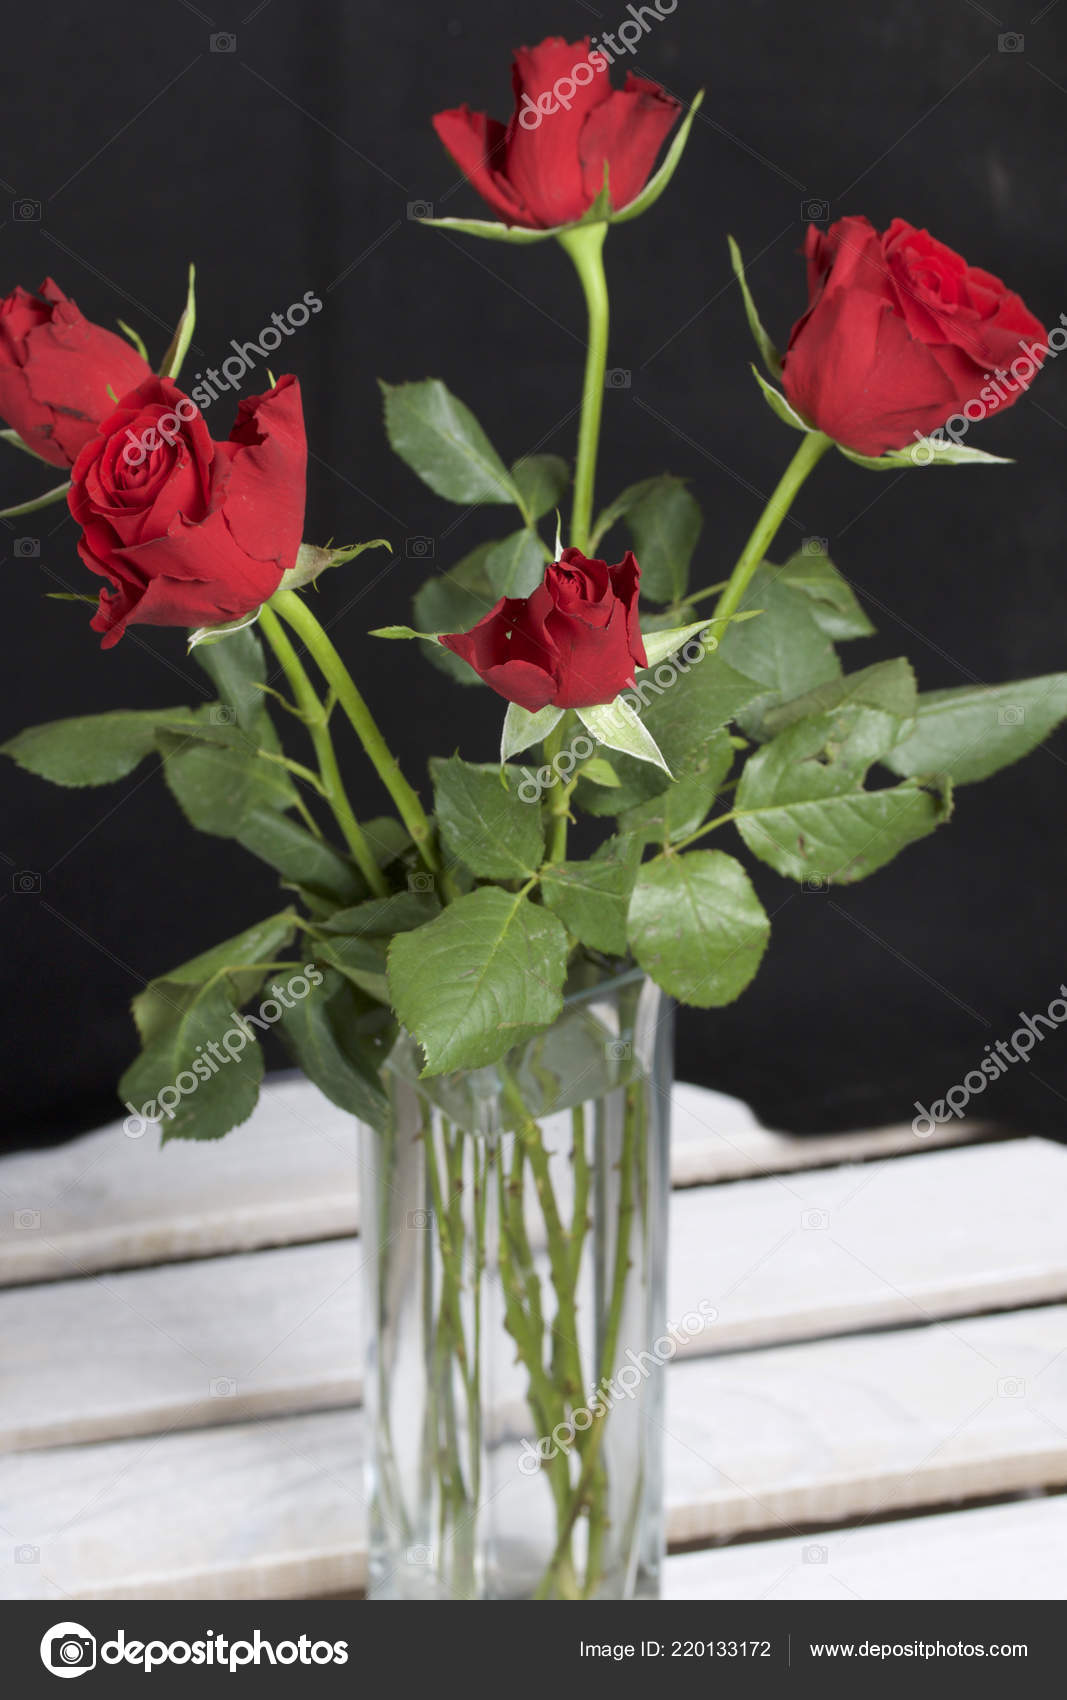 Bouquet Scarlet Roses Glass Vase Five Flowers Black Background Stock Photo C Depositvad 220133172